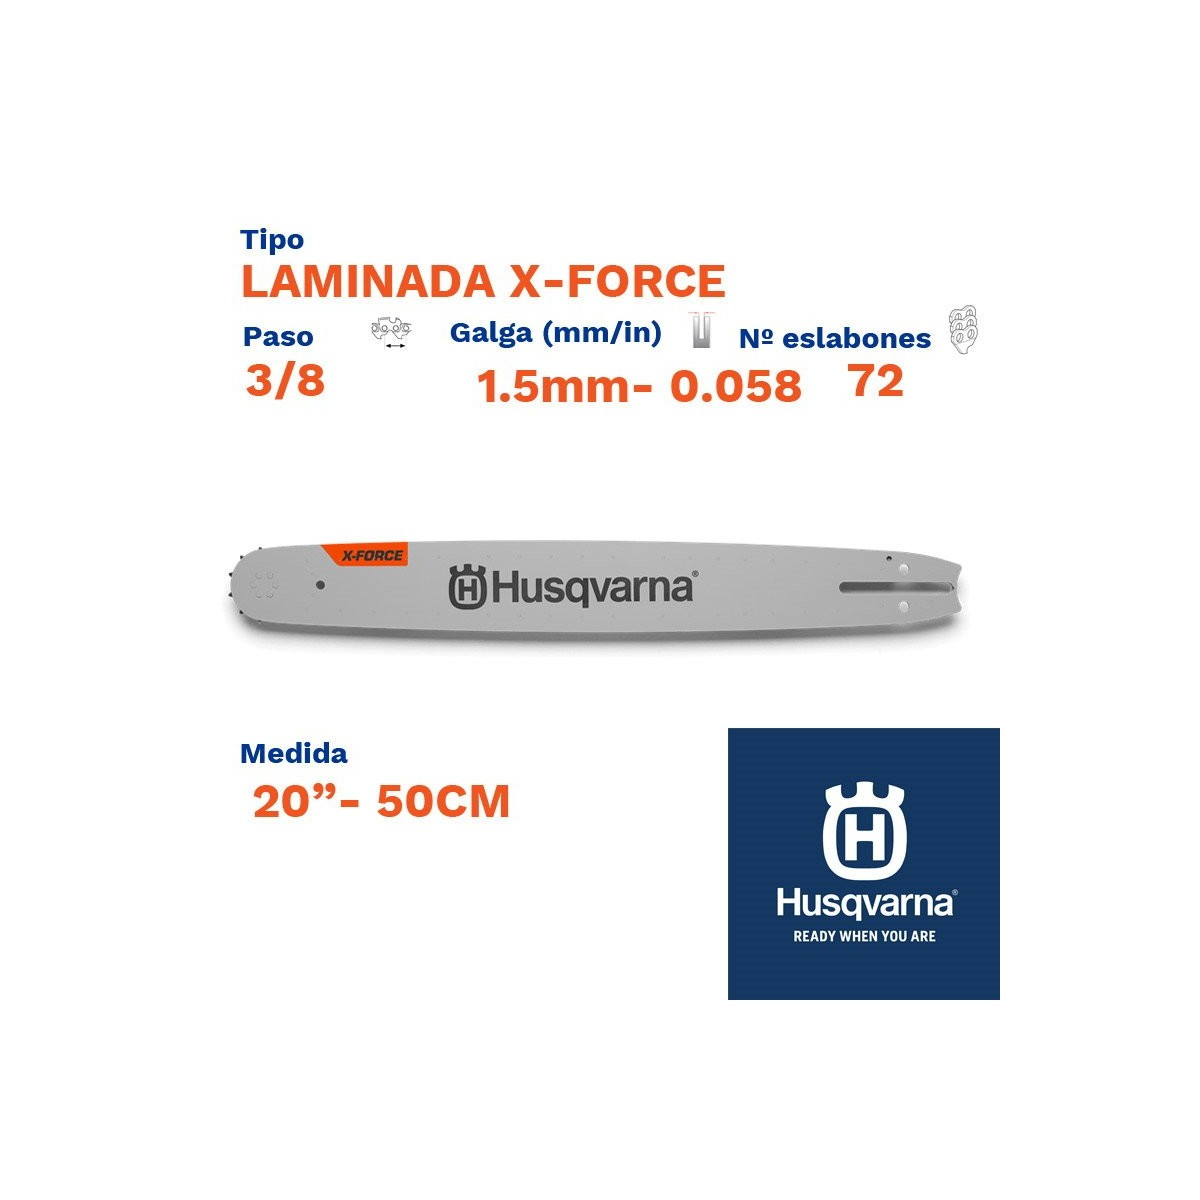 "Husqvarna espada laminada x-force 1.5mm 72 eslabones-pc 3/8   20""- 50cm"